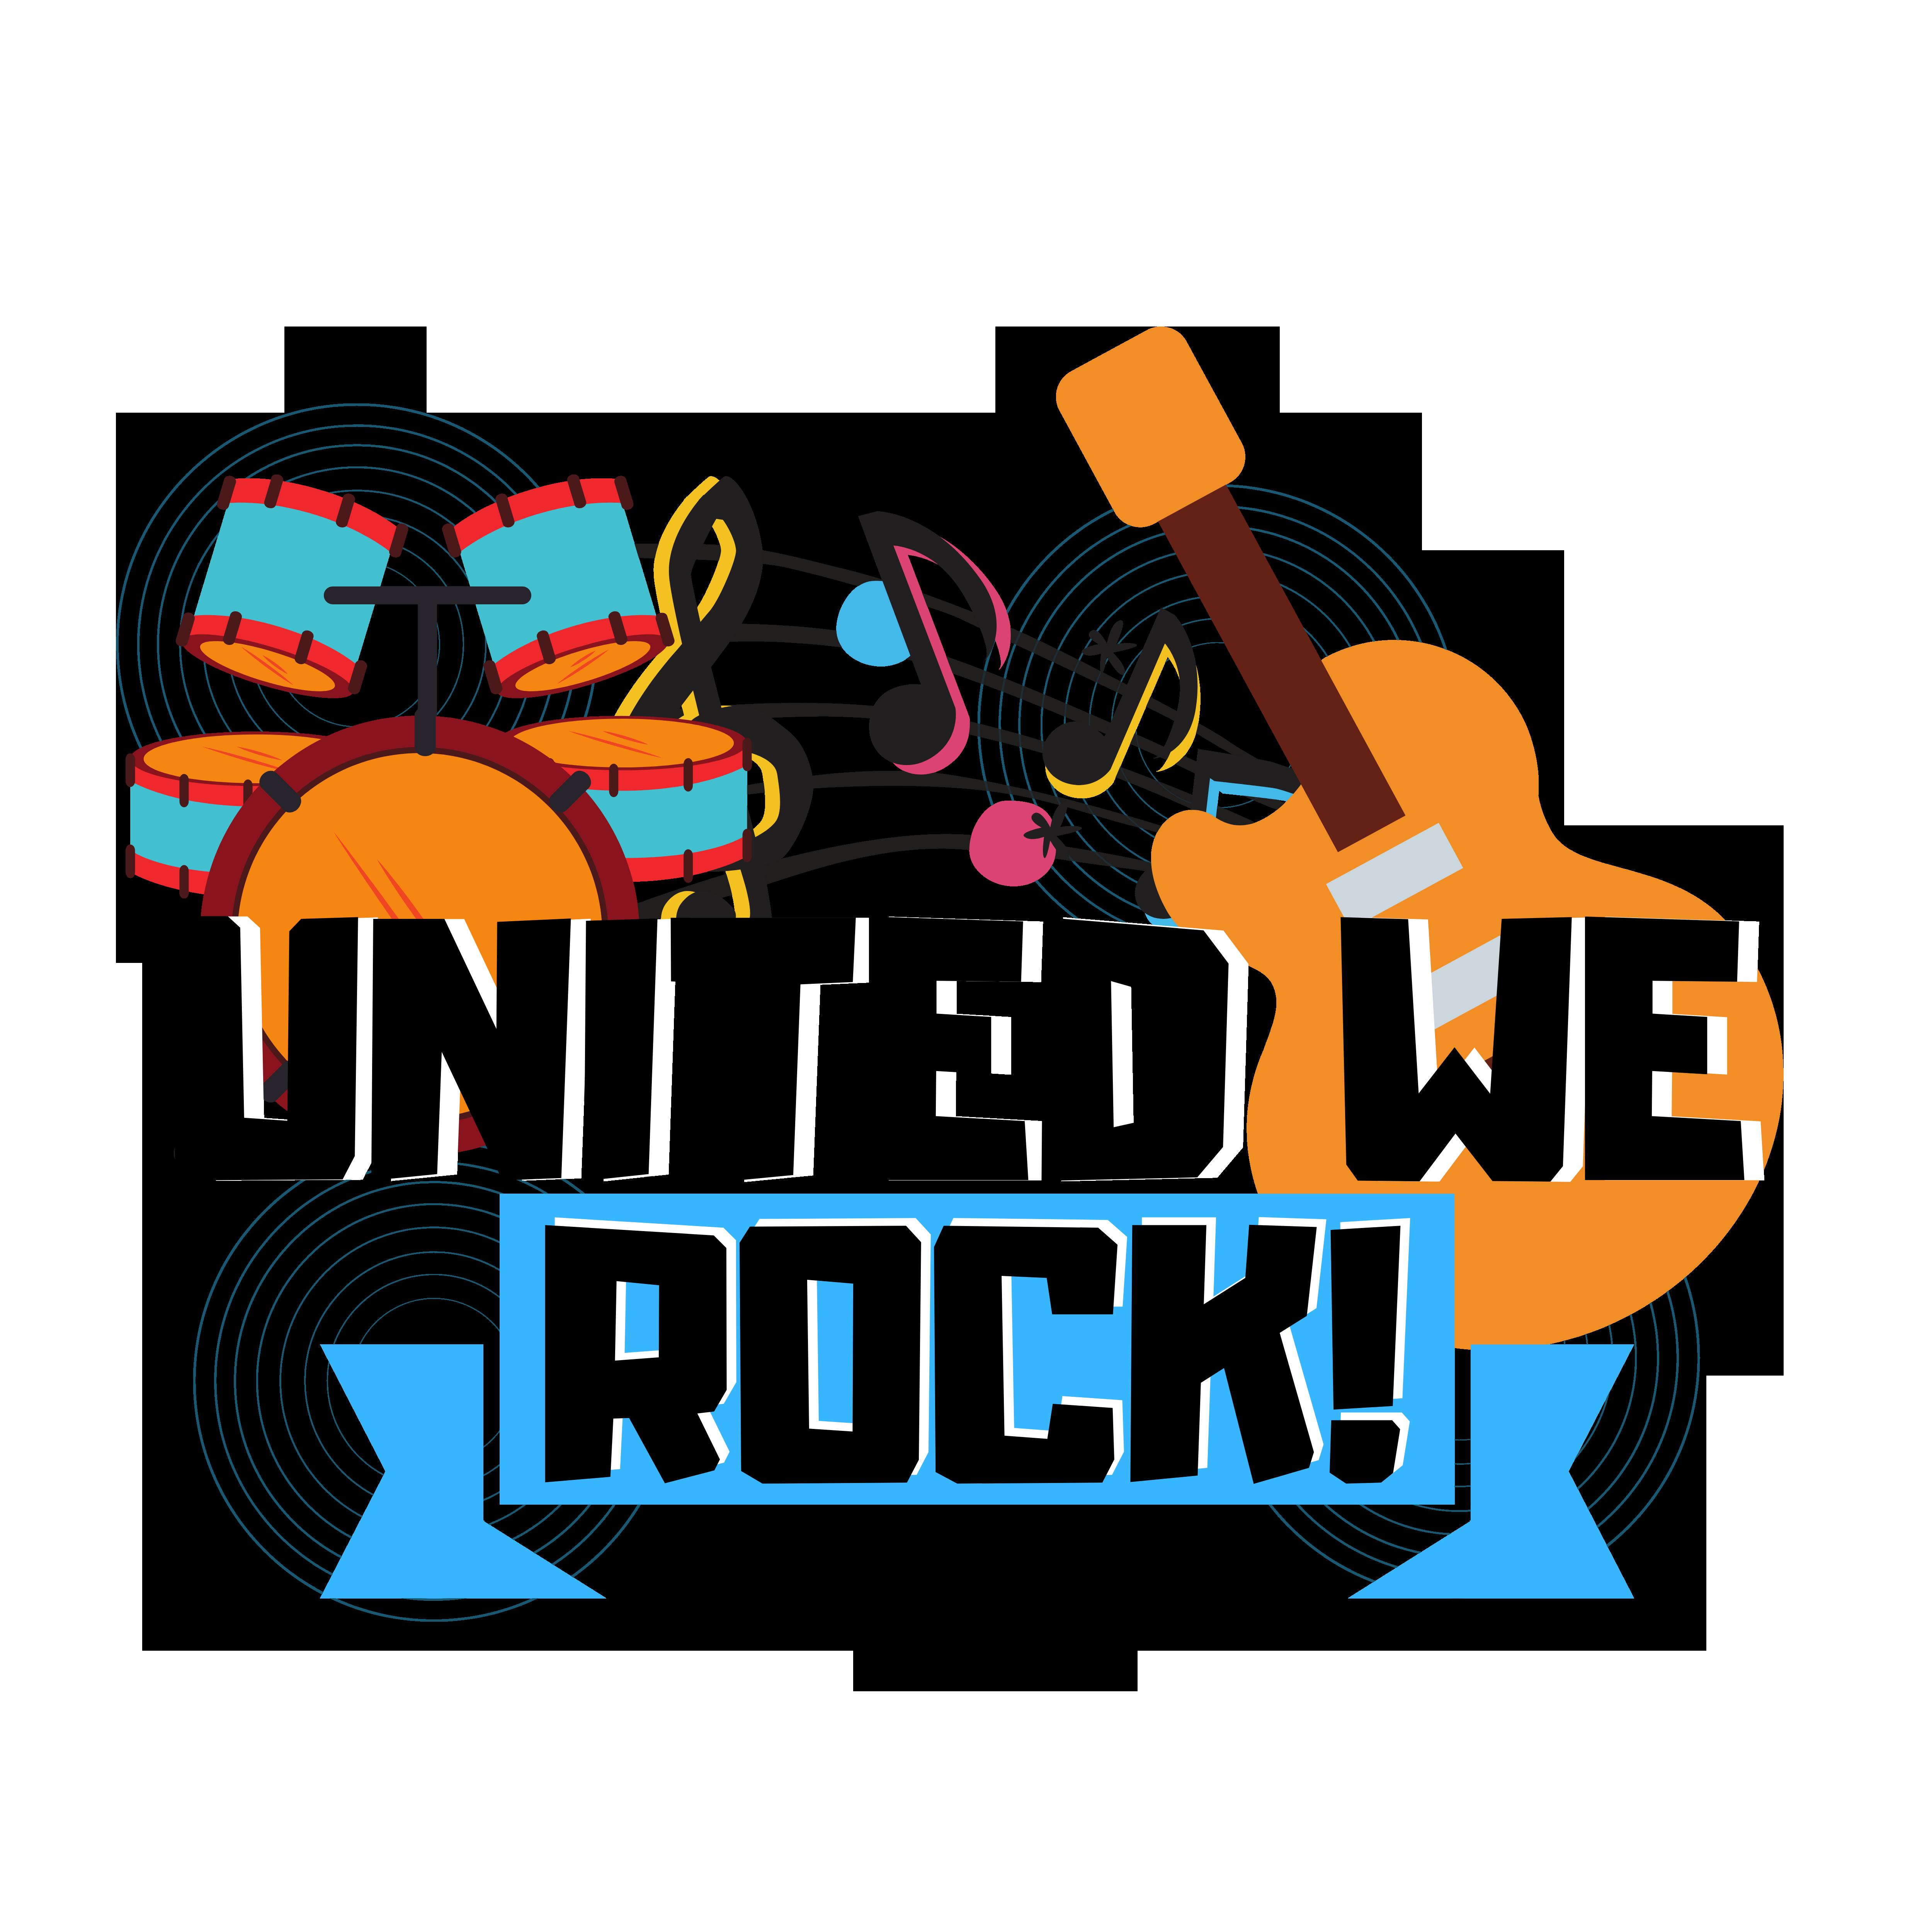 United We Rock!